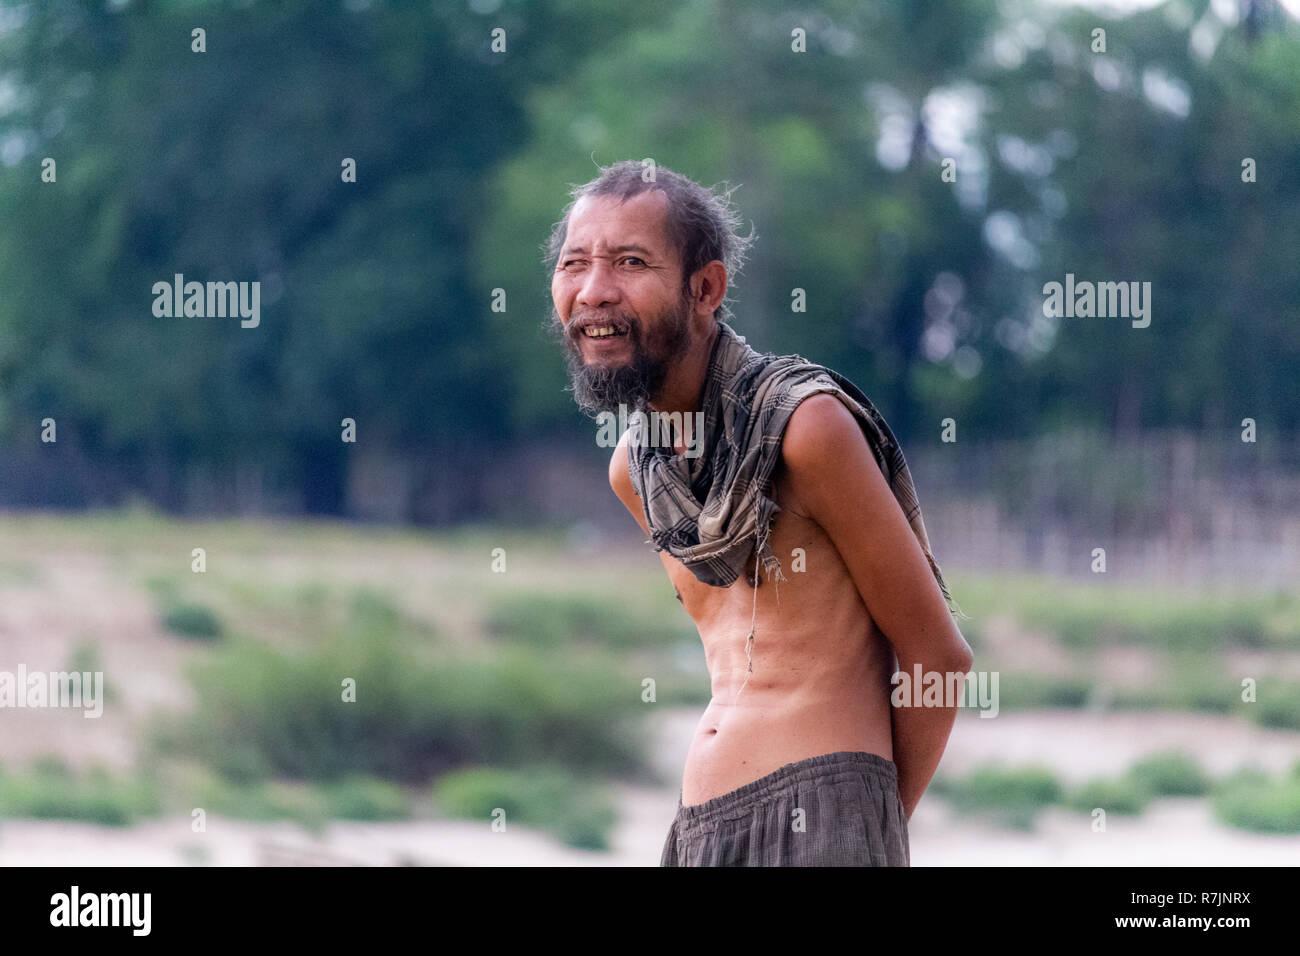 Don Daeng, Laos - 27. April 2018: Shirtless senior lokaler Mann gehen durch einen Strand in einer abgelegenen Insel des Mekong in Laos. Stockfoto